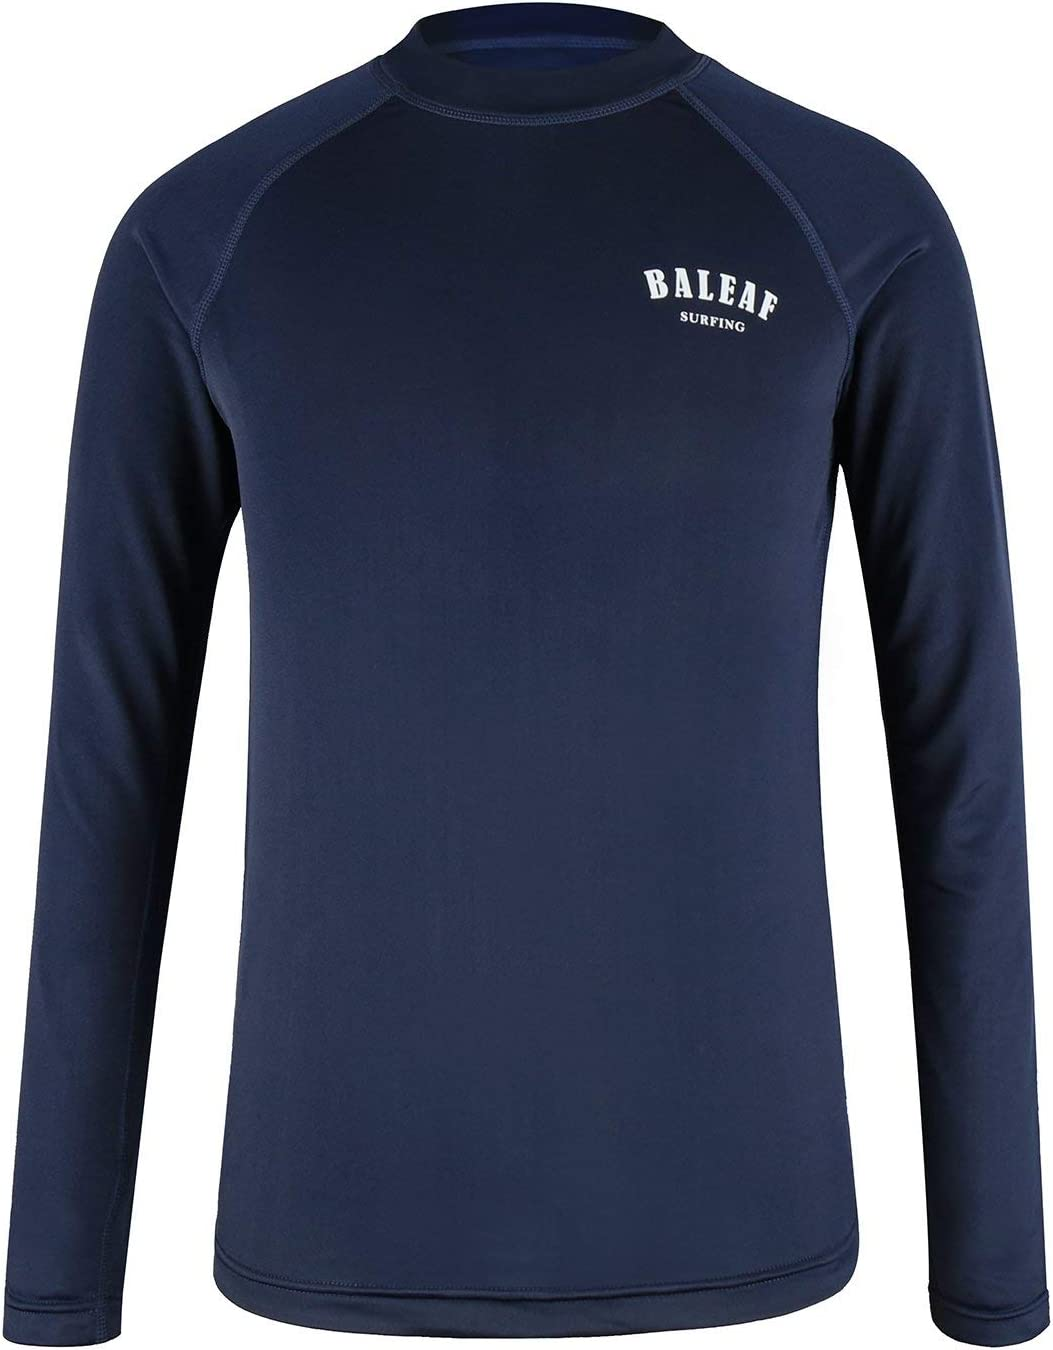 BALEAF Big Boys' Short Sleeve Rashguard Quick Dry Swim Shirt UPF 50+